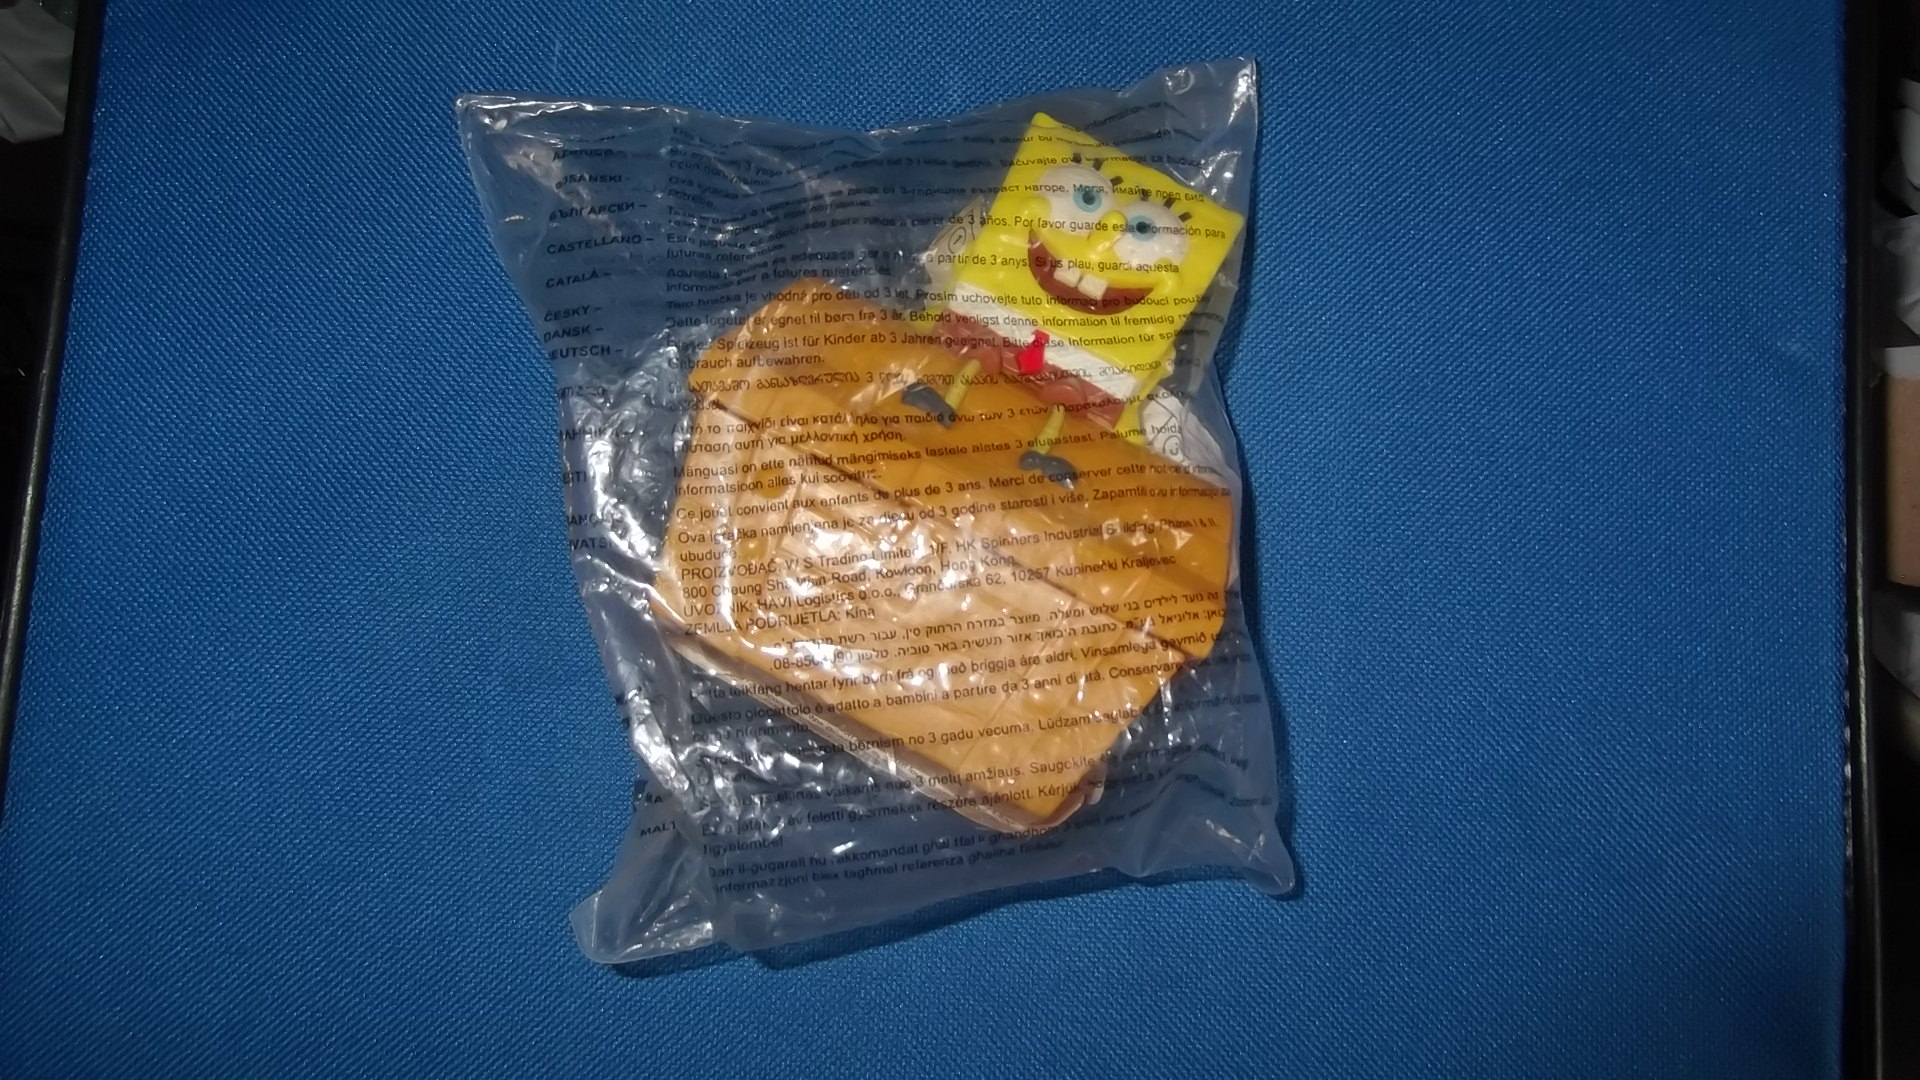 McDonalds Spongebob Squarepants Spongebob Treasure Chest Toy From 2012 New